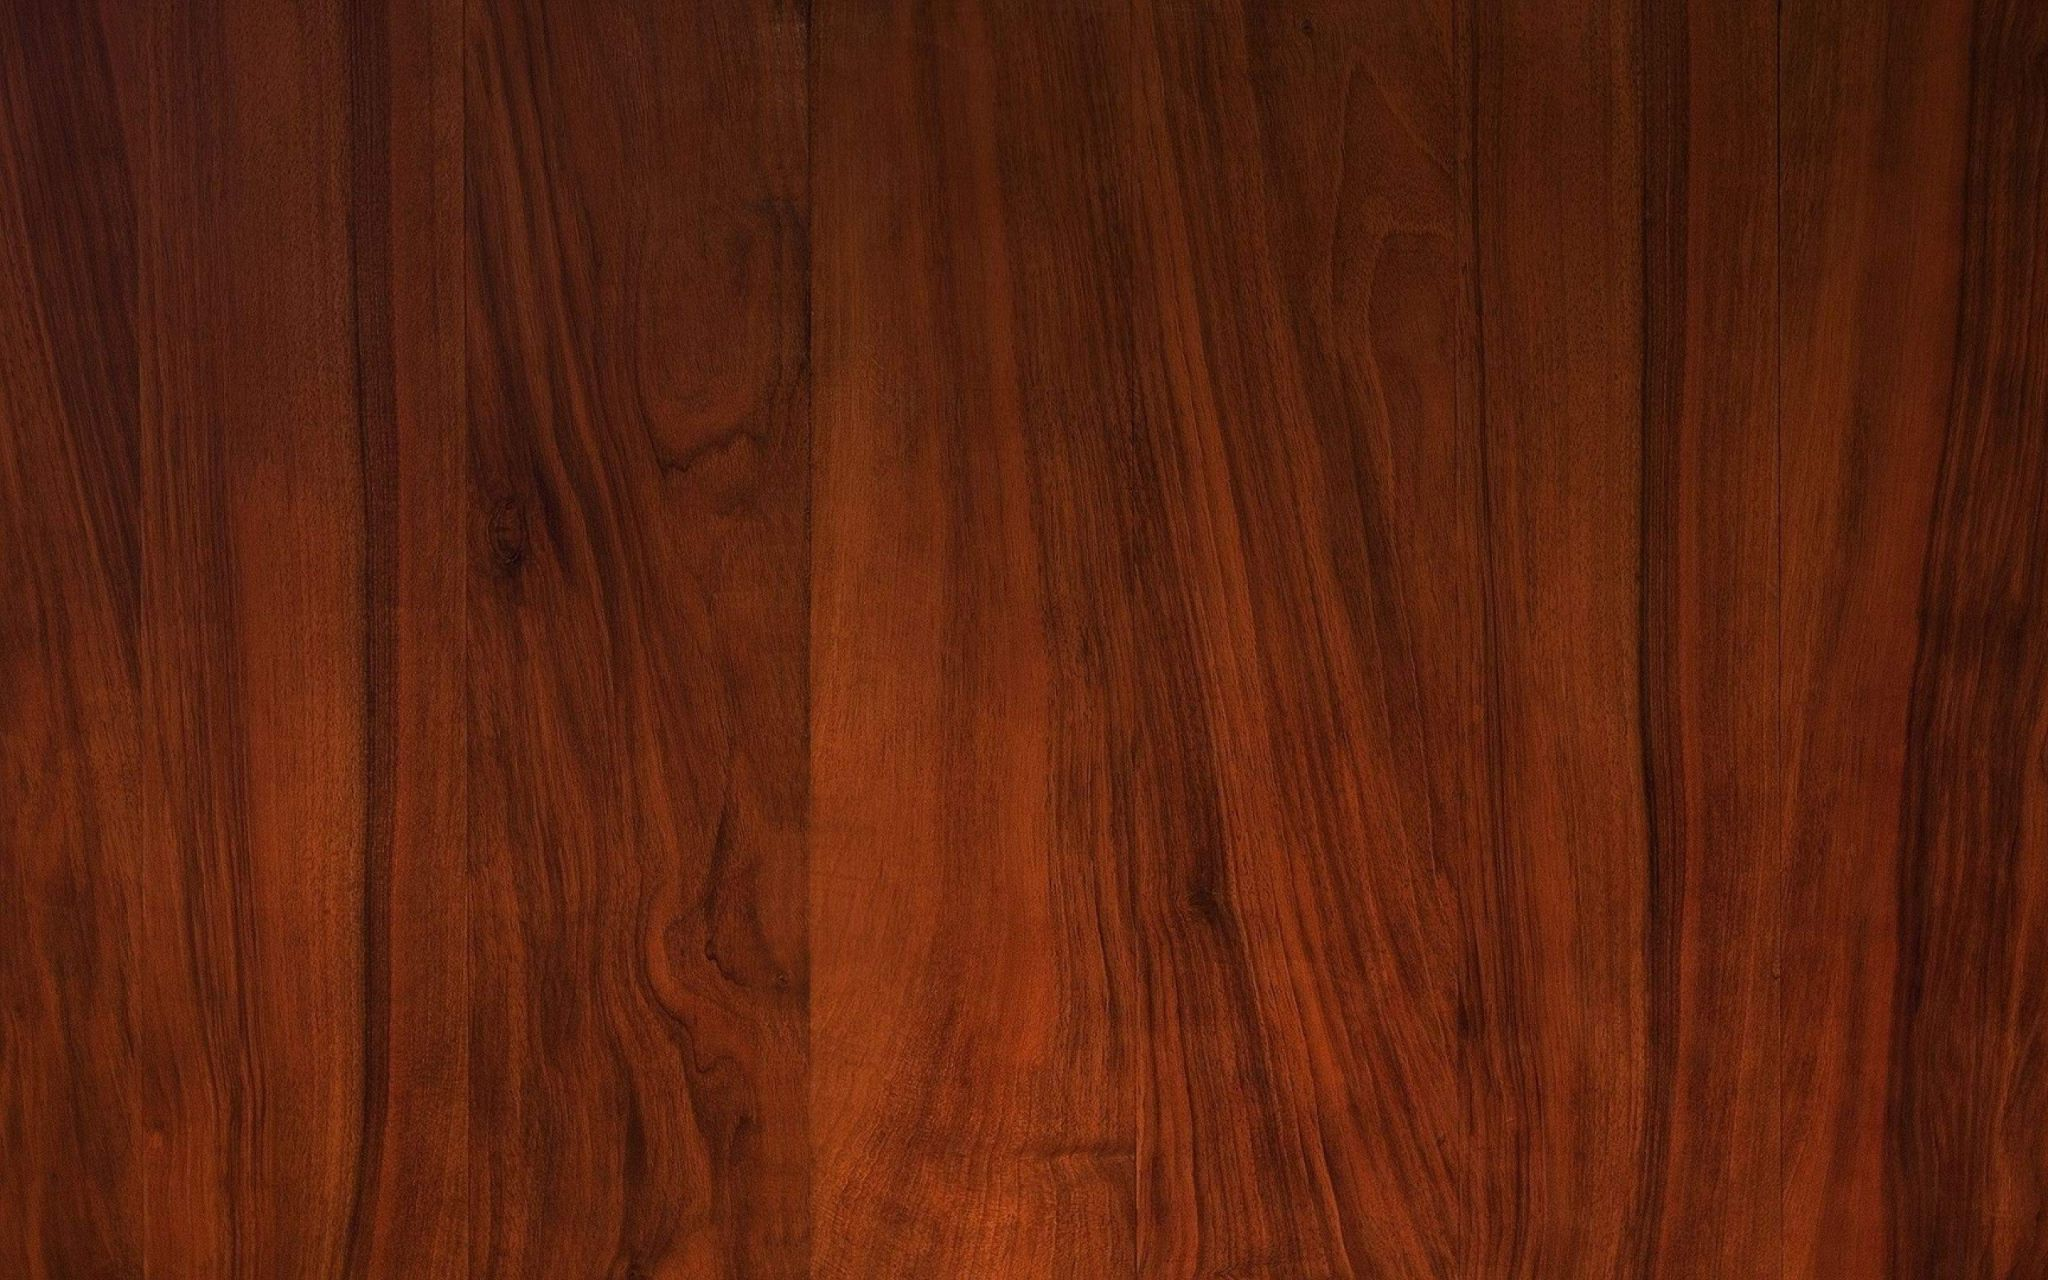 wood background hd Wood background in 2019 Wood grain 2048x1280